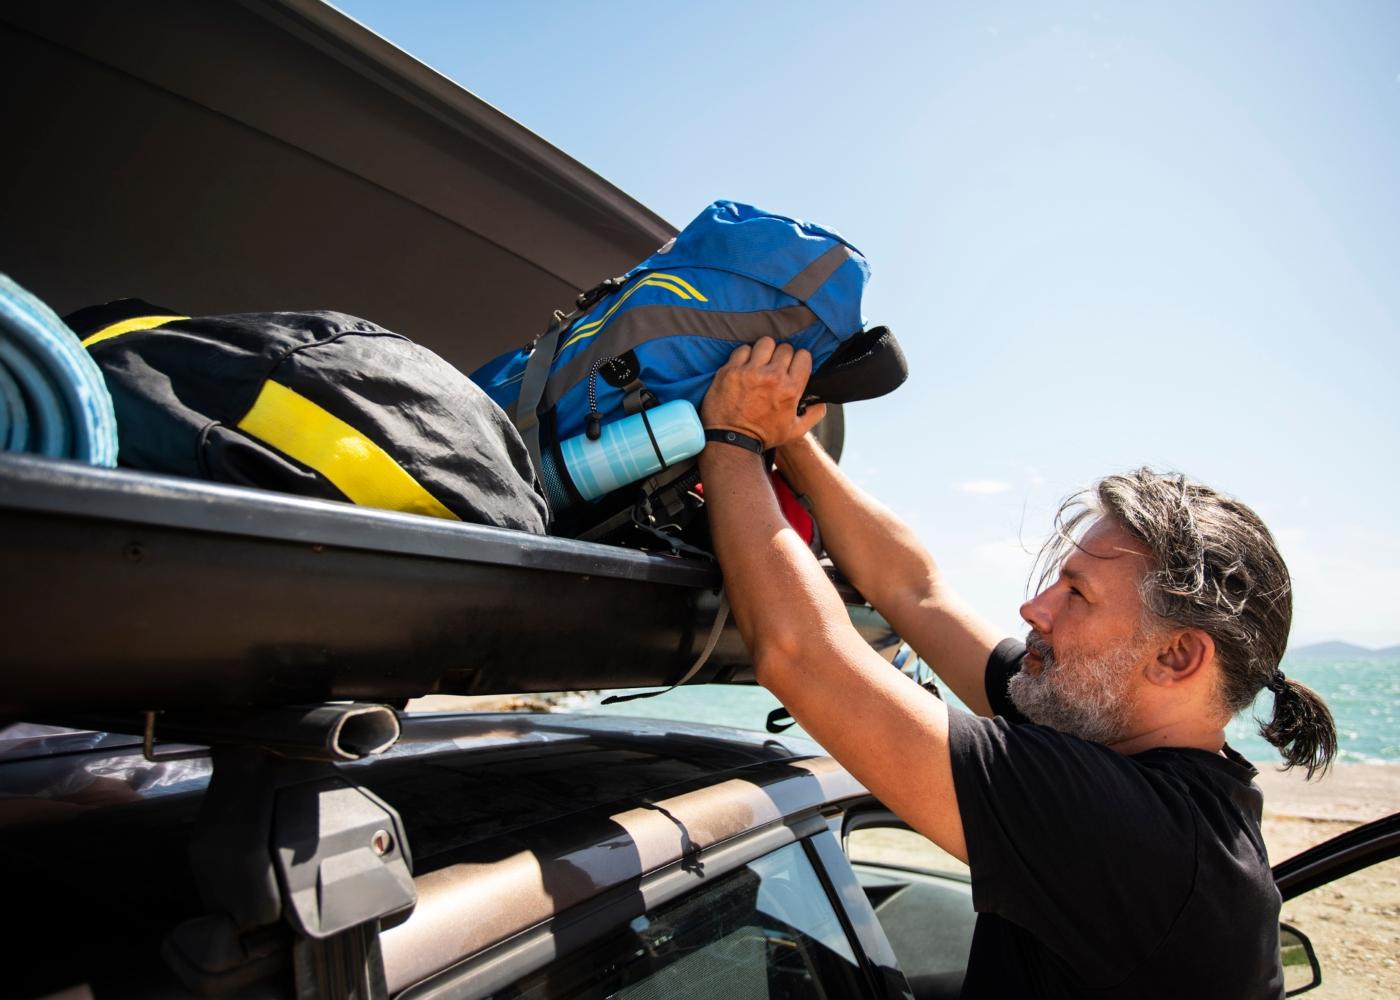 Homem a acomodar bagagem